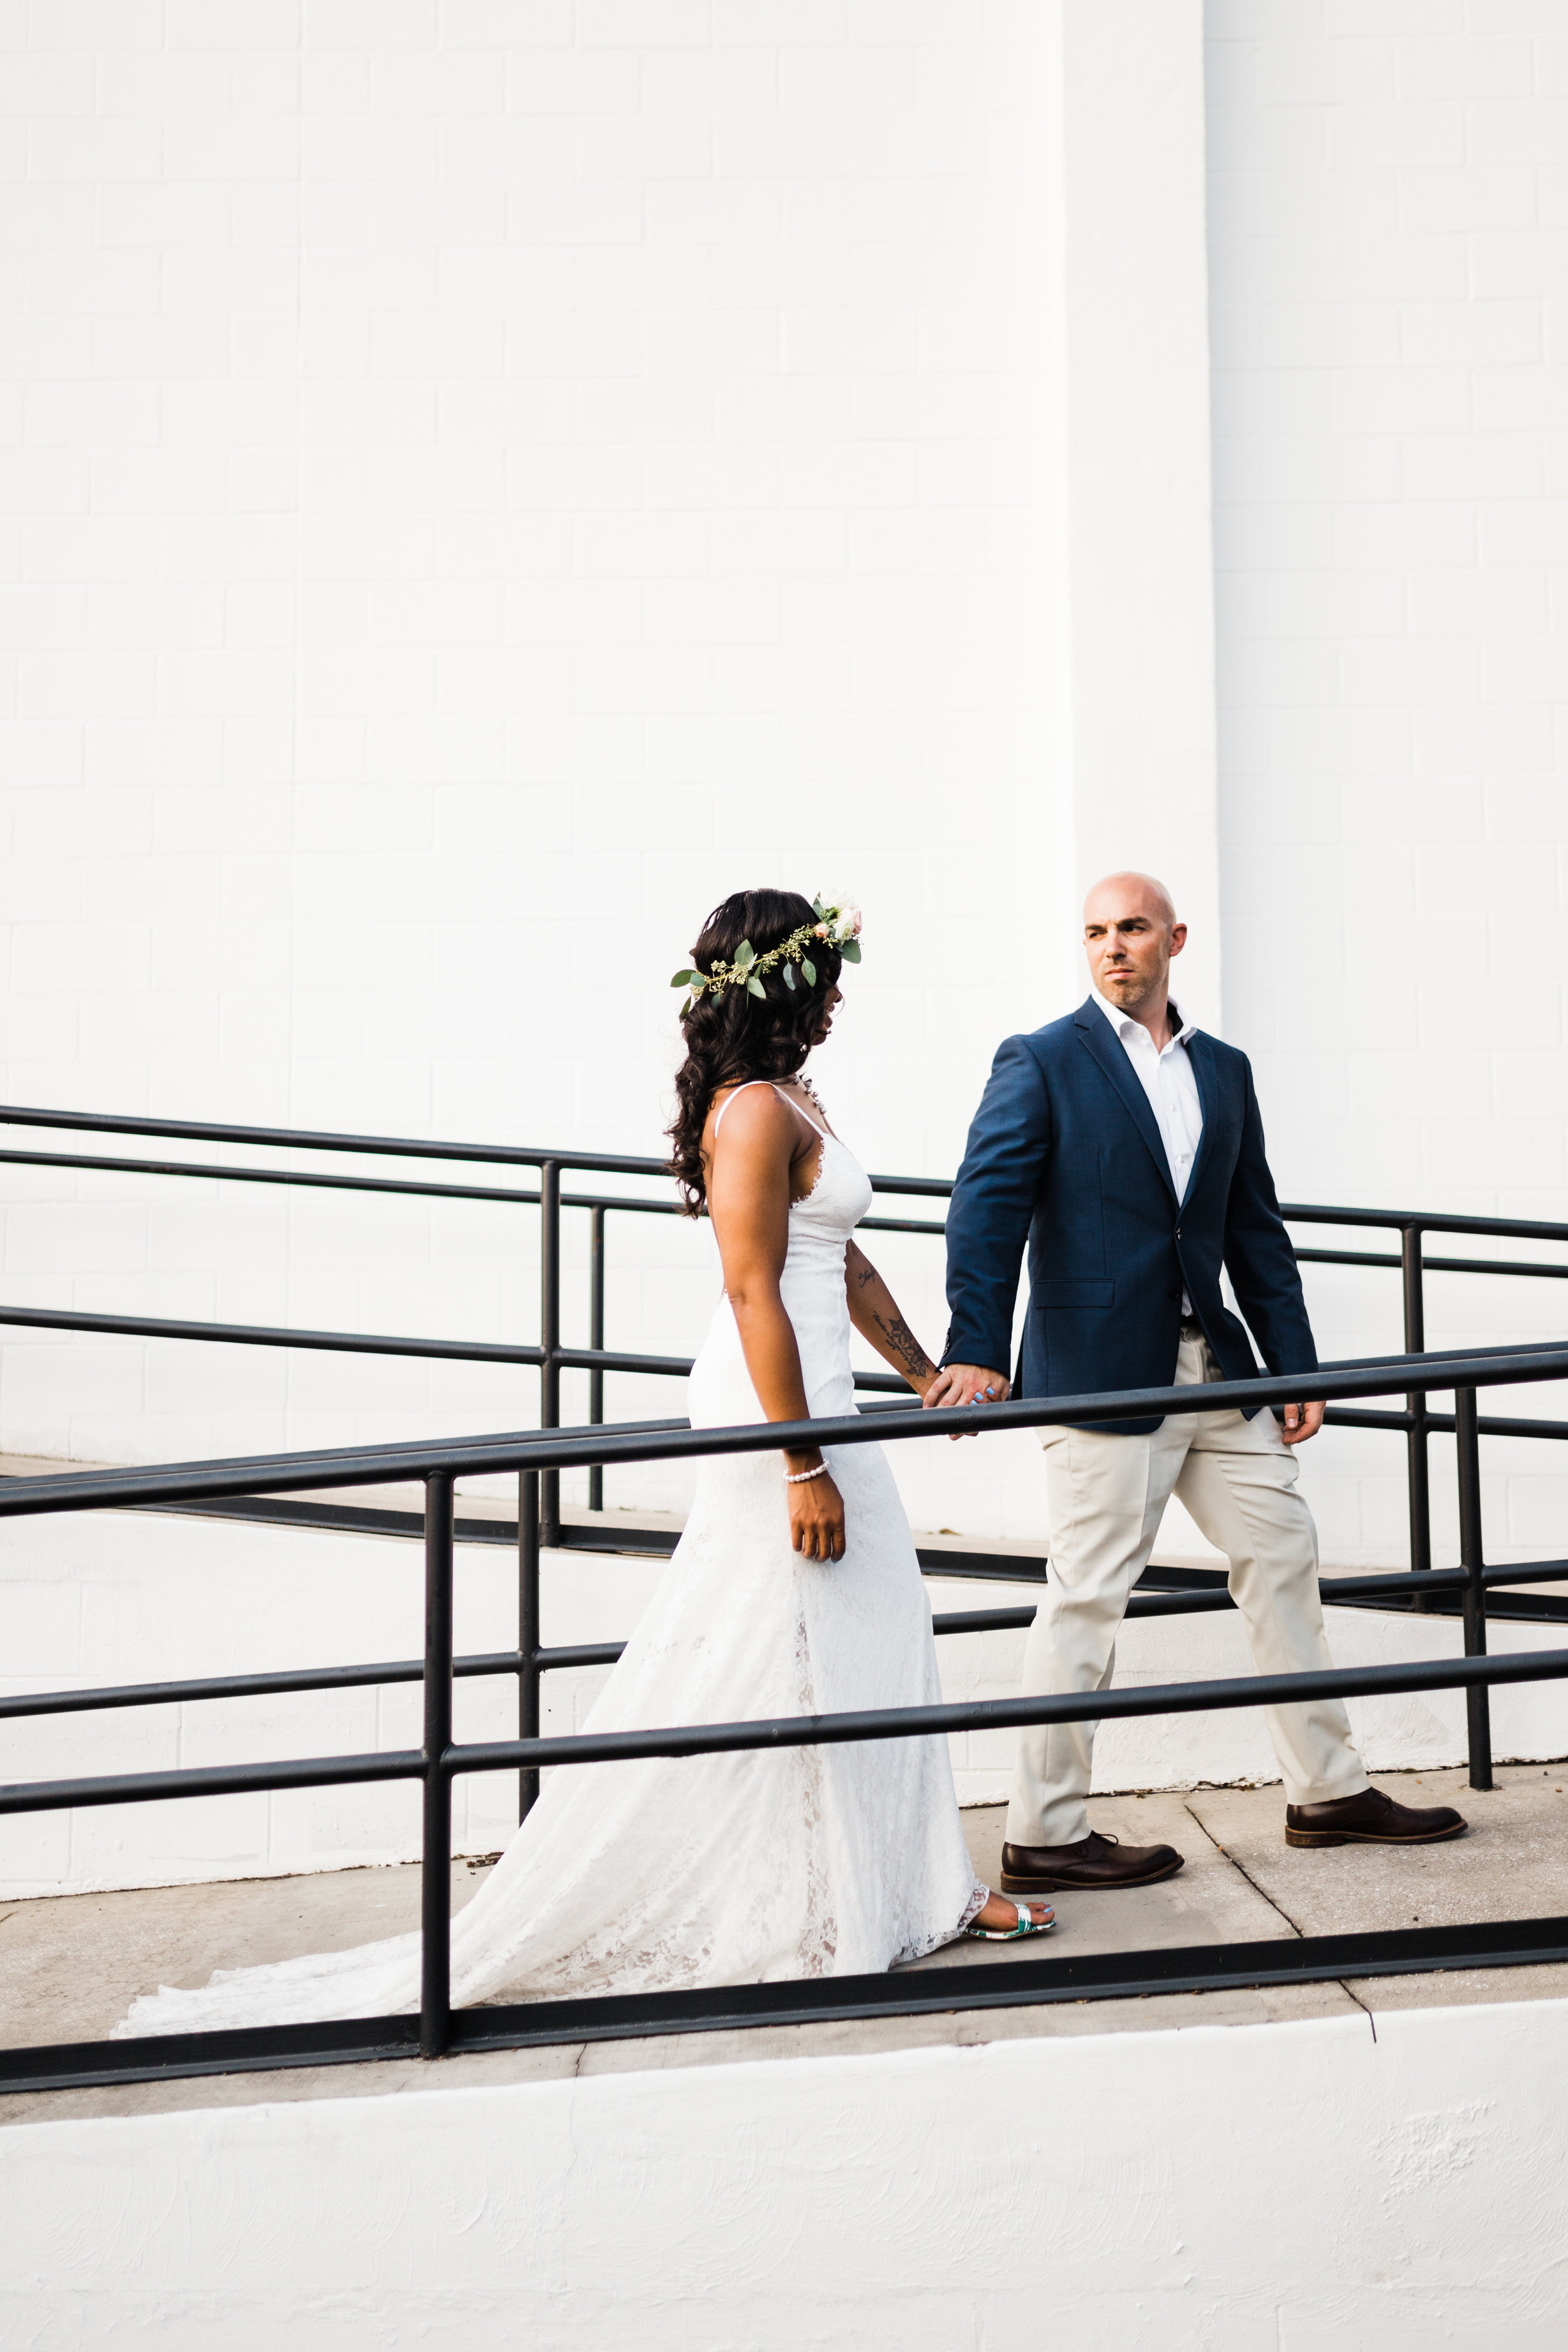 2017.09.16 Ashley and Chuck O'Day Quantam Leap Winery Wedding (437 of 462).jpg